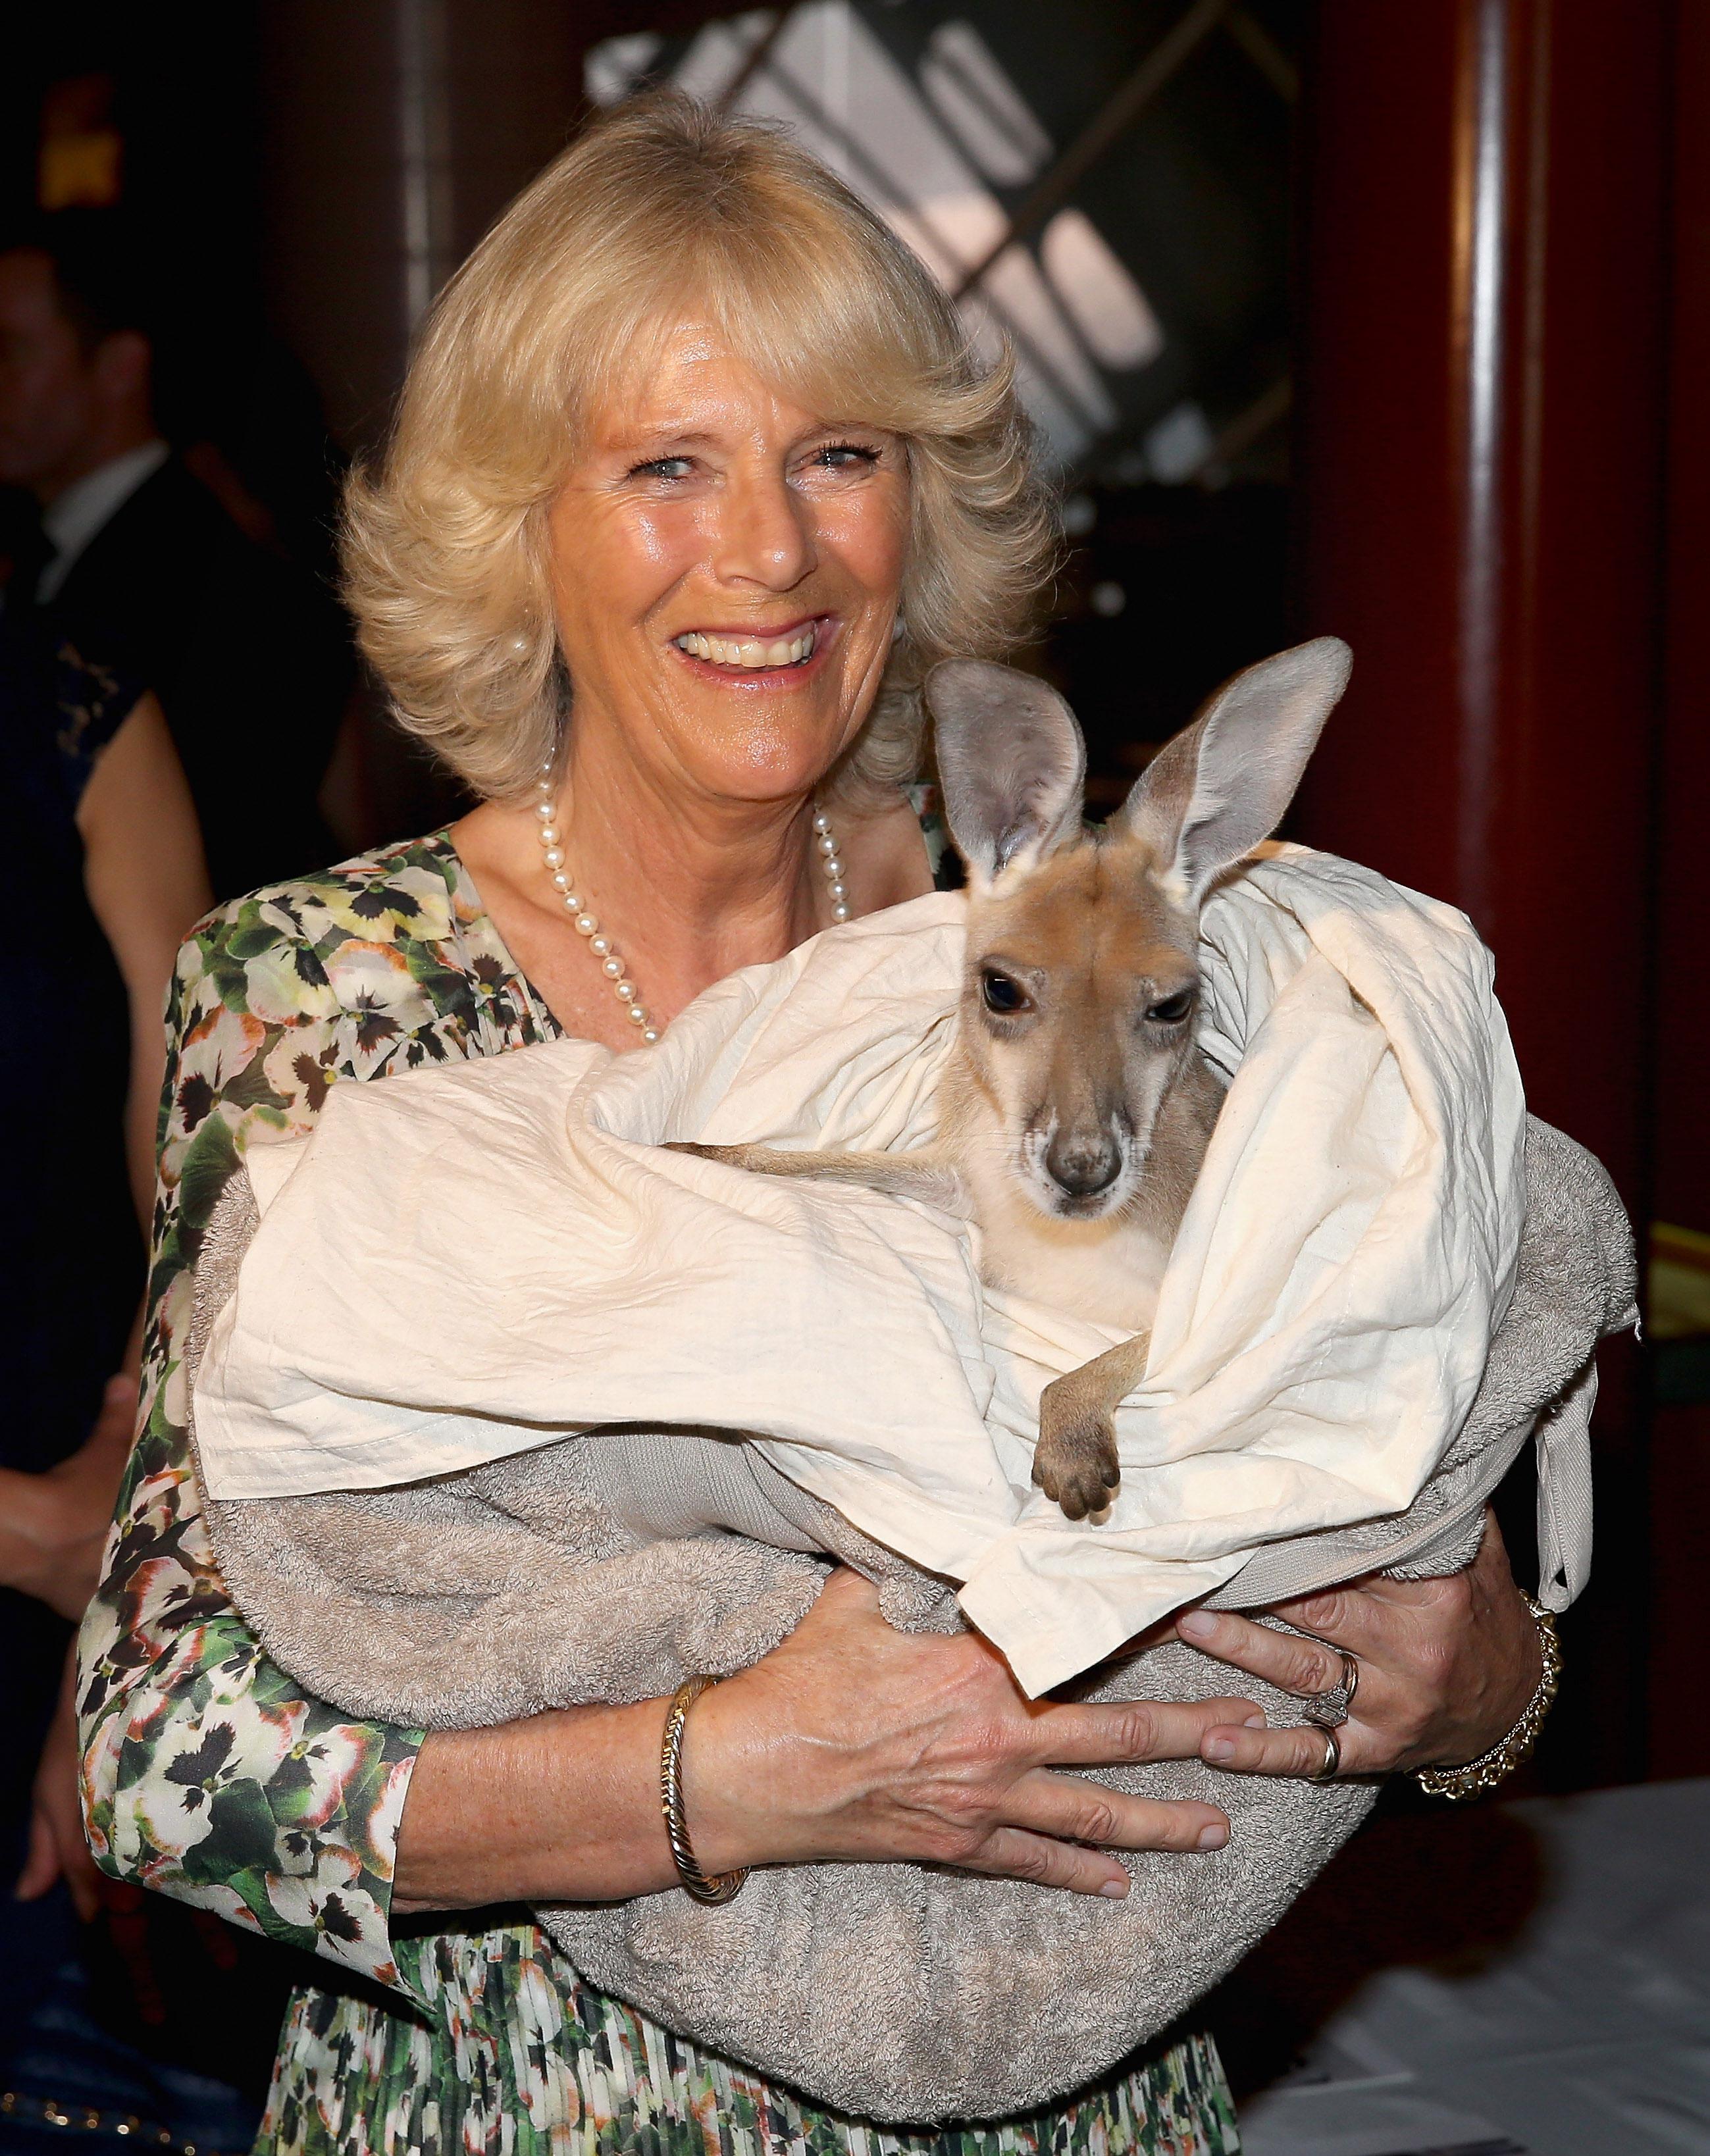 Camilla makes 'generous and practical' donation to Australian bushfire victims